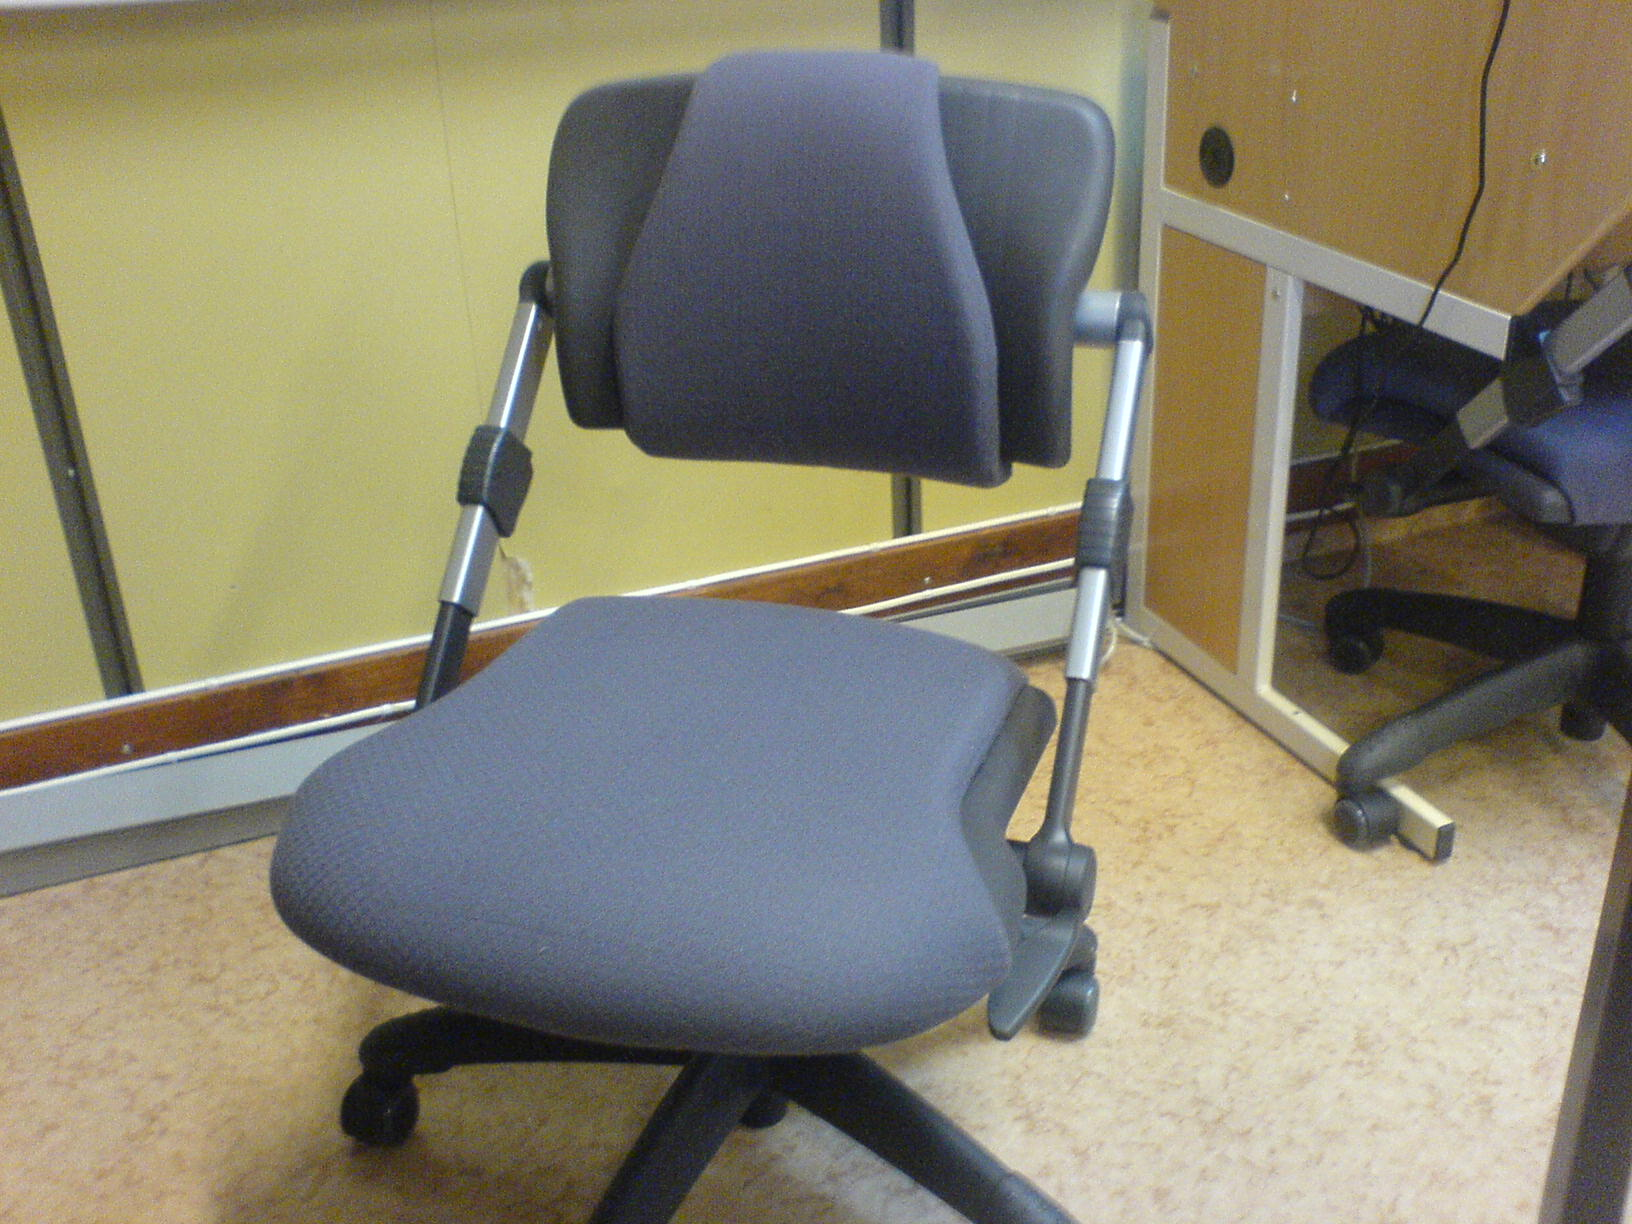 hvor kan jeg kjøpe denne kontor stolen? Hus, hage og